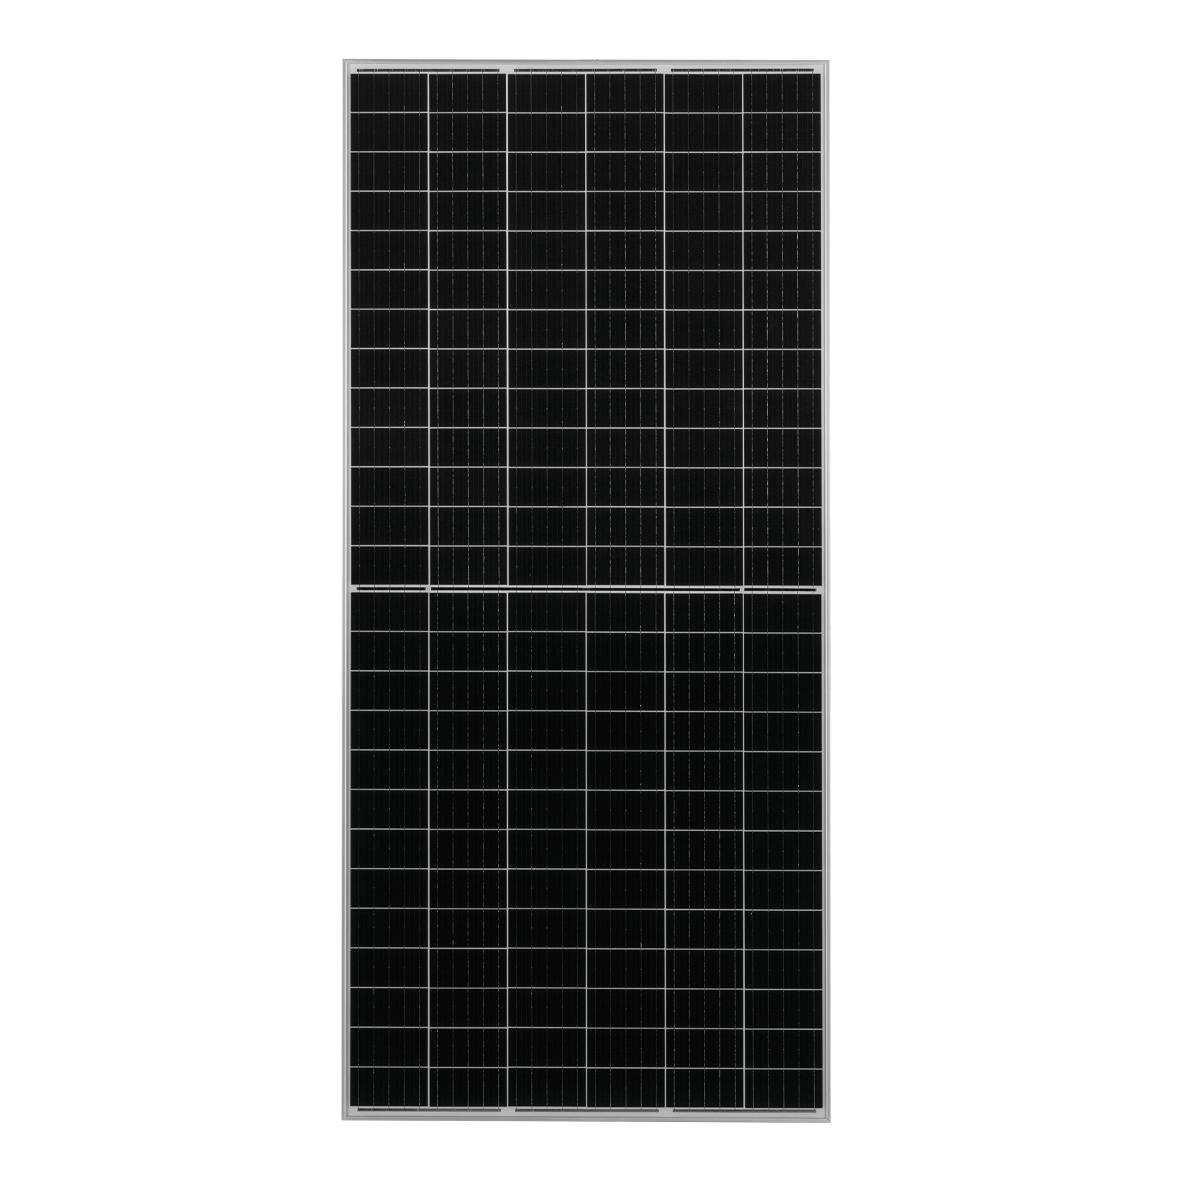 Módulo Fotovoltaico Monocristalino Intelbras Half-Cell EMSJ 445M HC